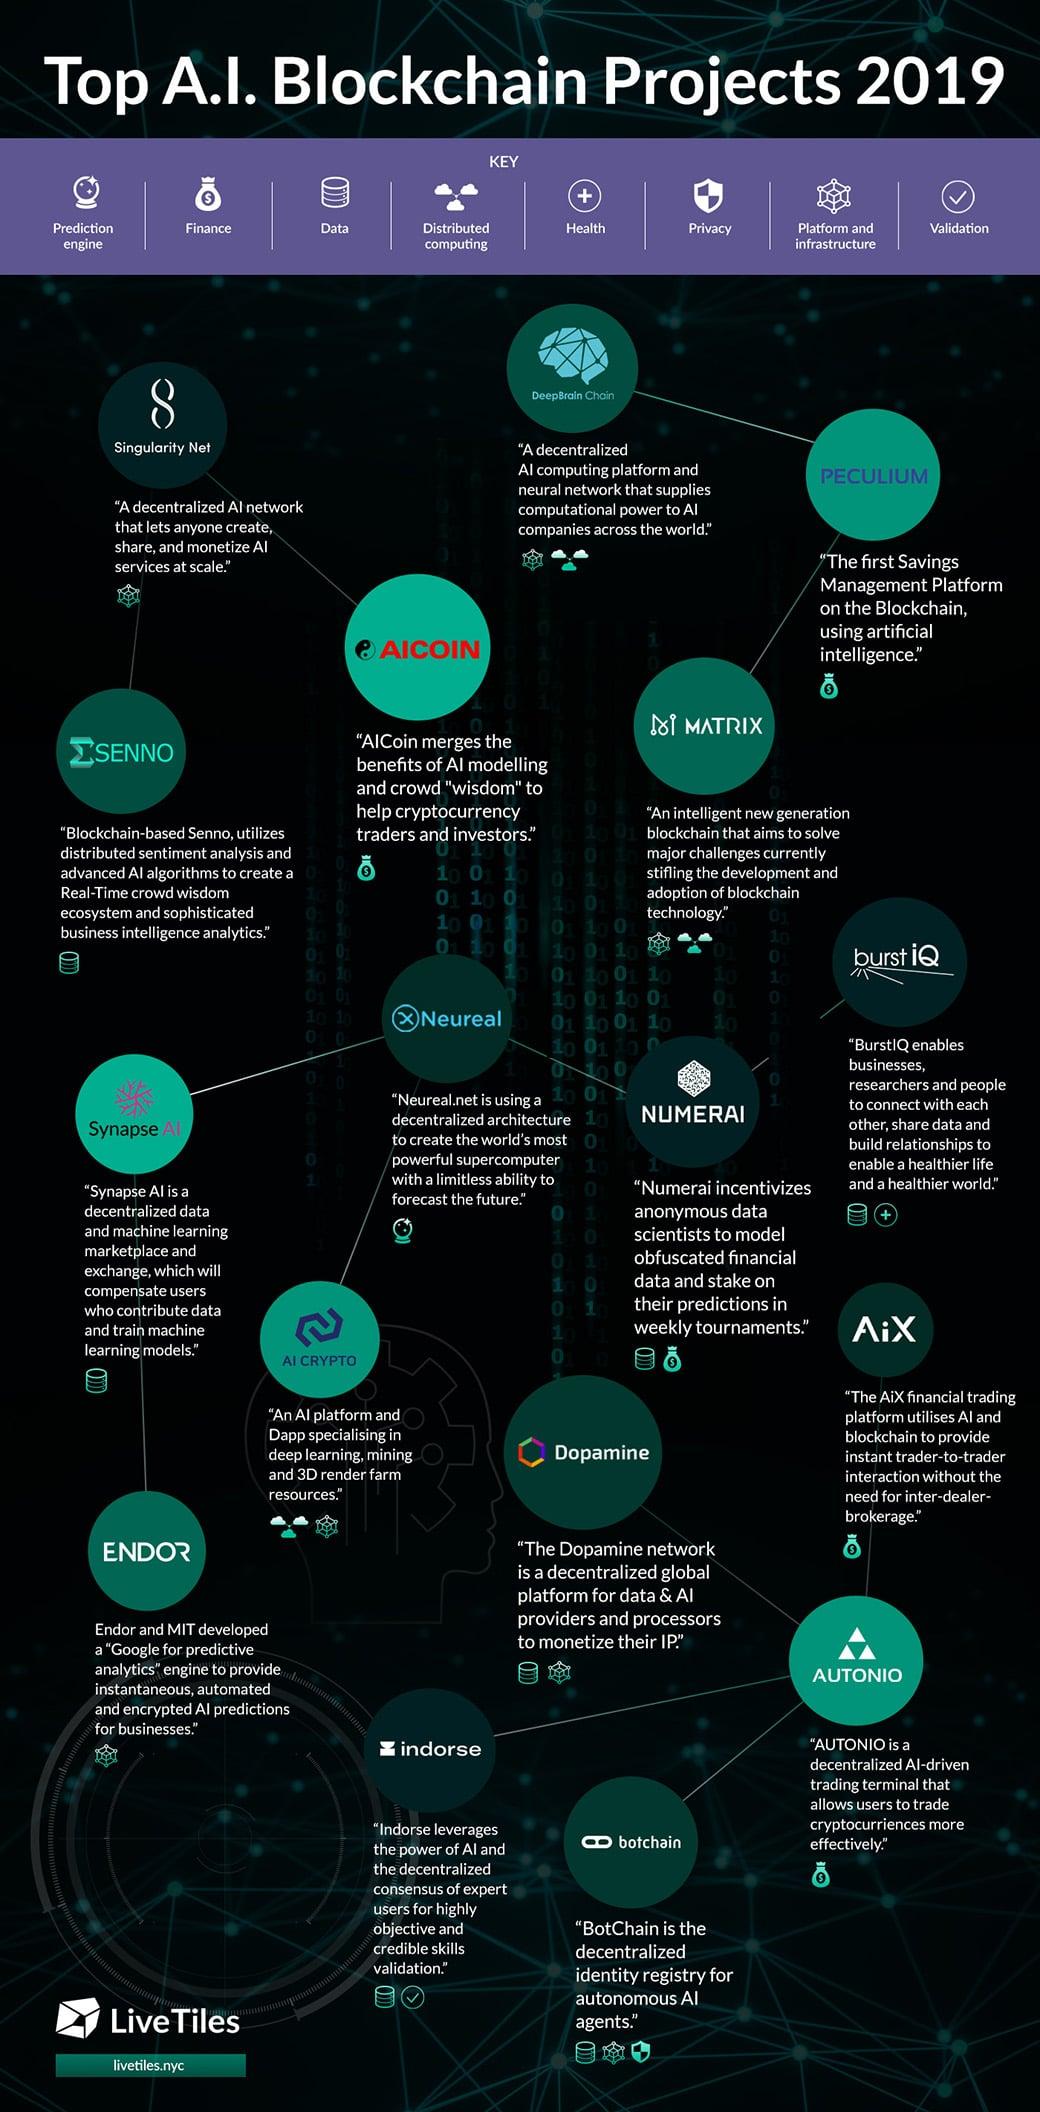 AI Blockchain projects in 2019